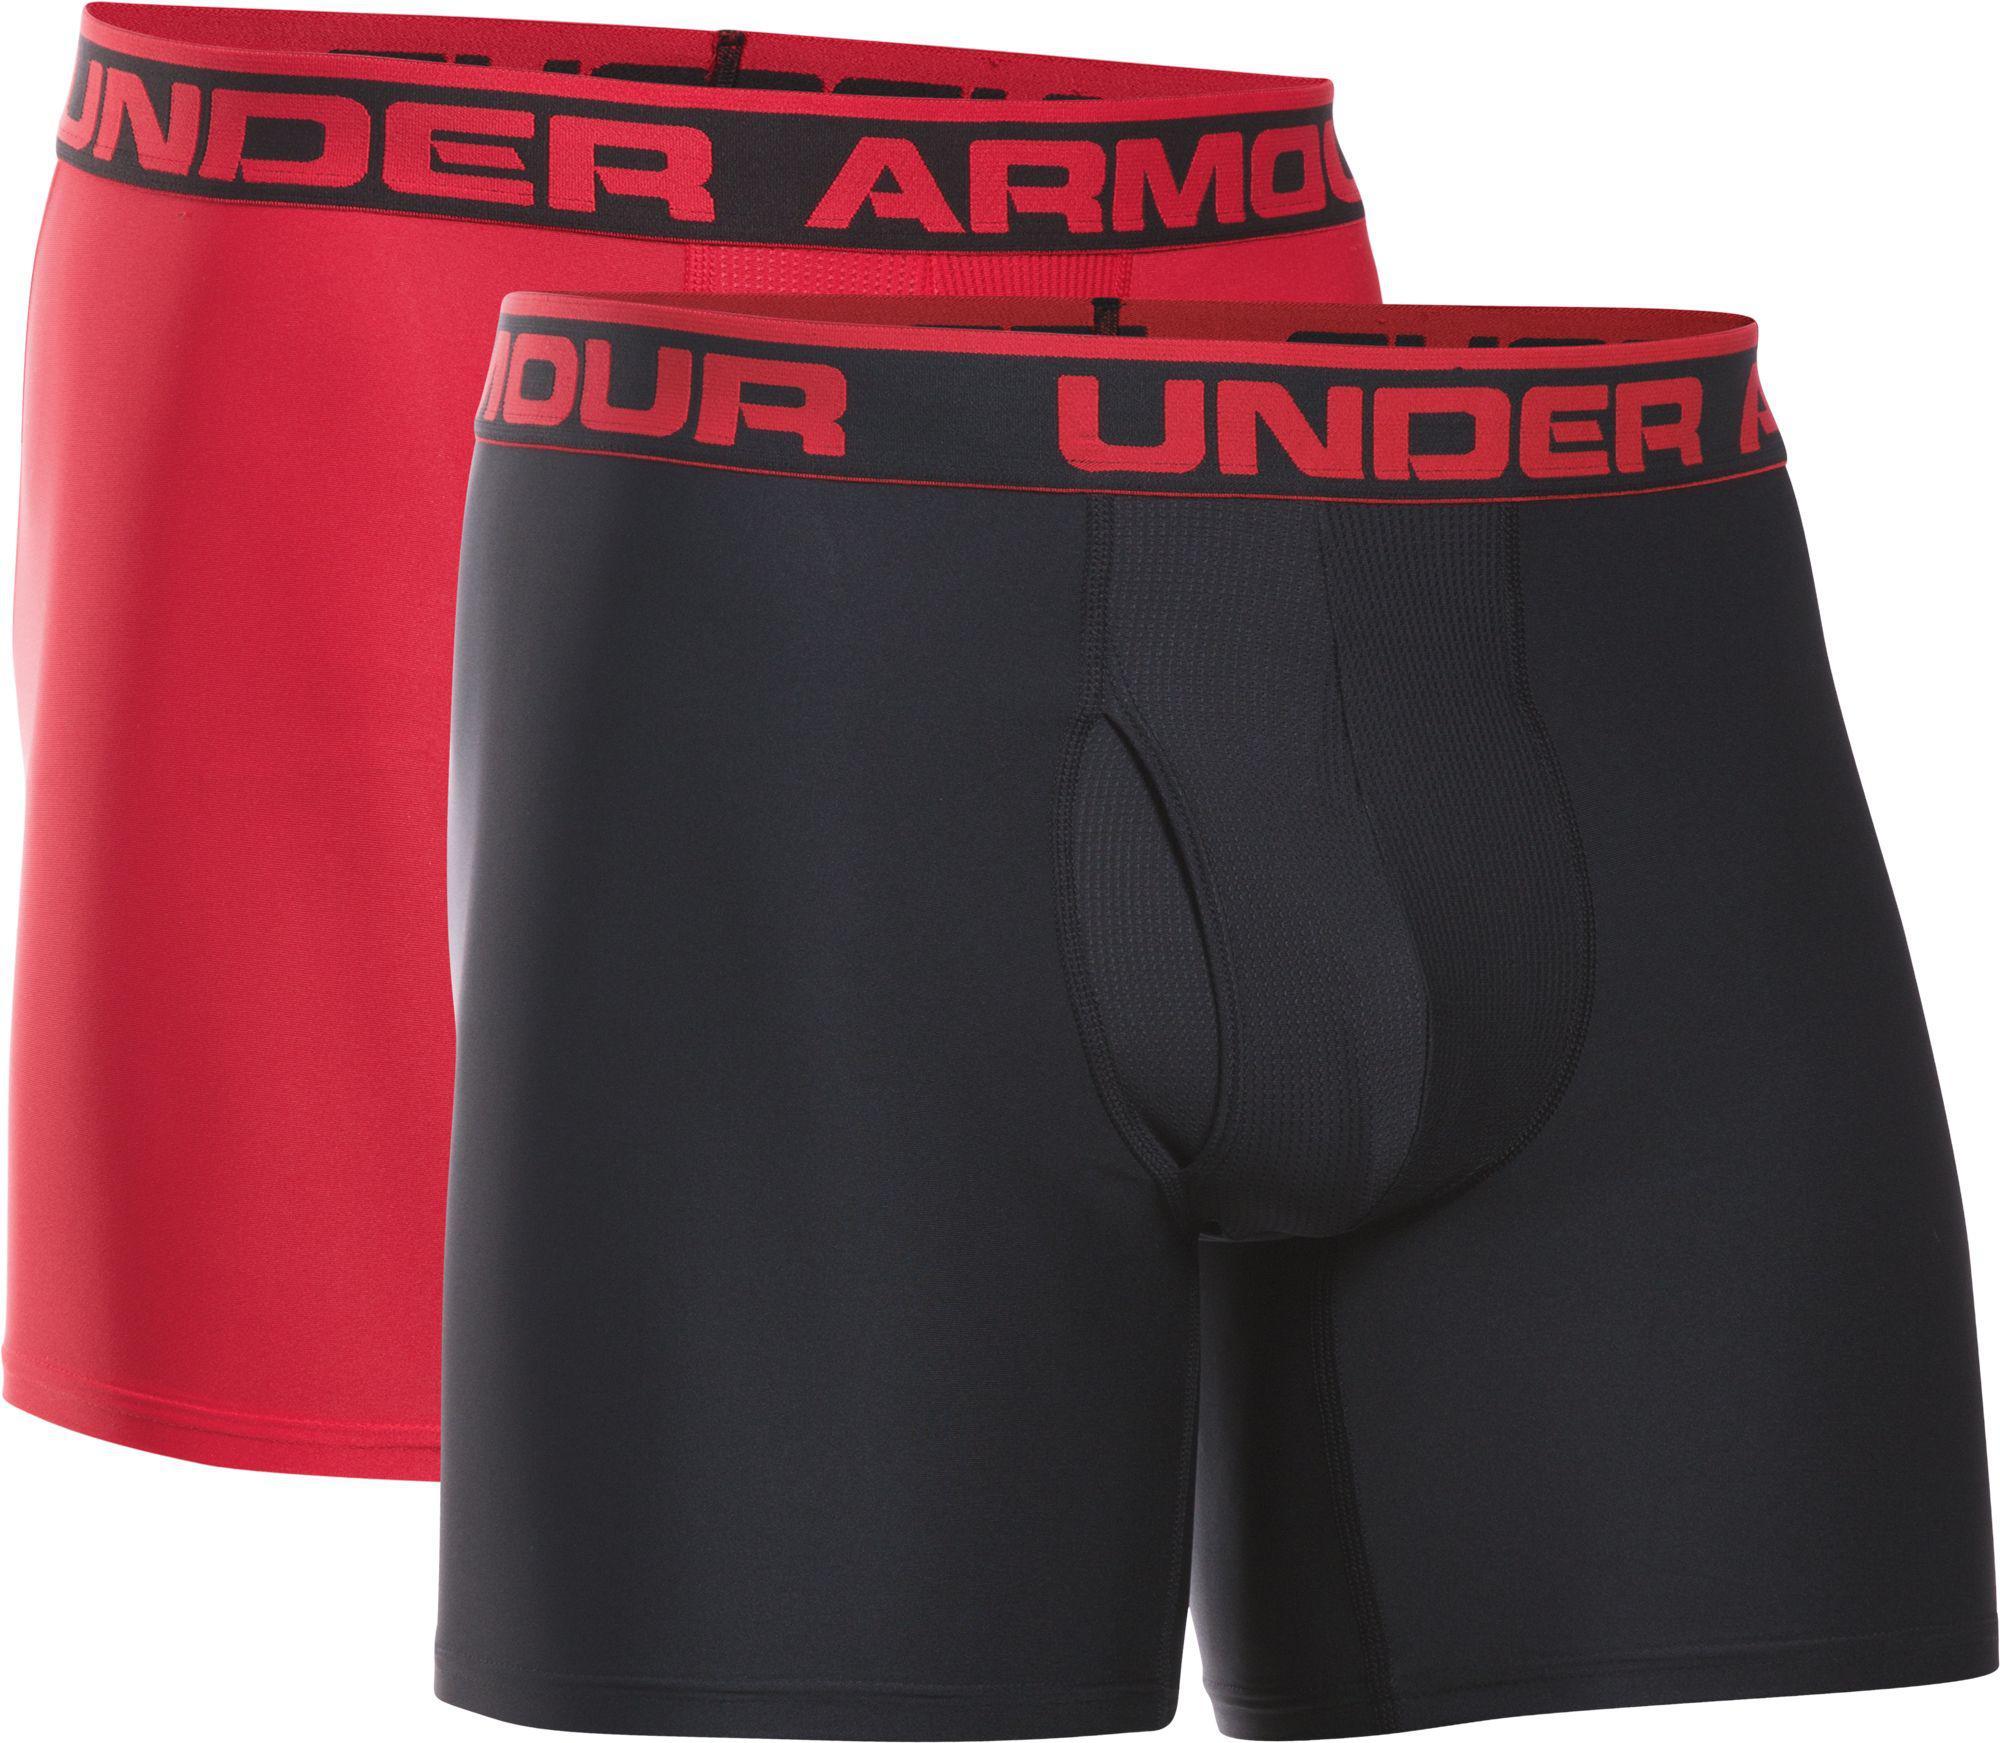 dbf579b4b004 Under Armour - Black O Series 6'' Boxerjock Boxer Briefs 2 Pack for Men